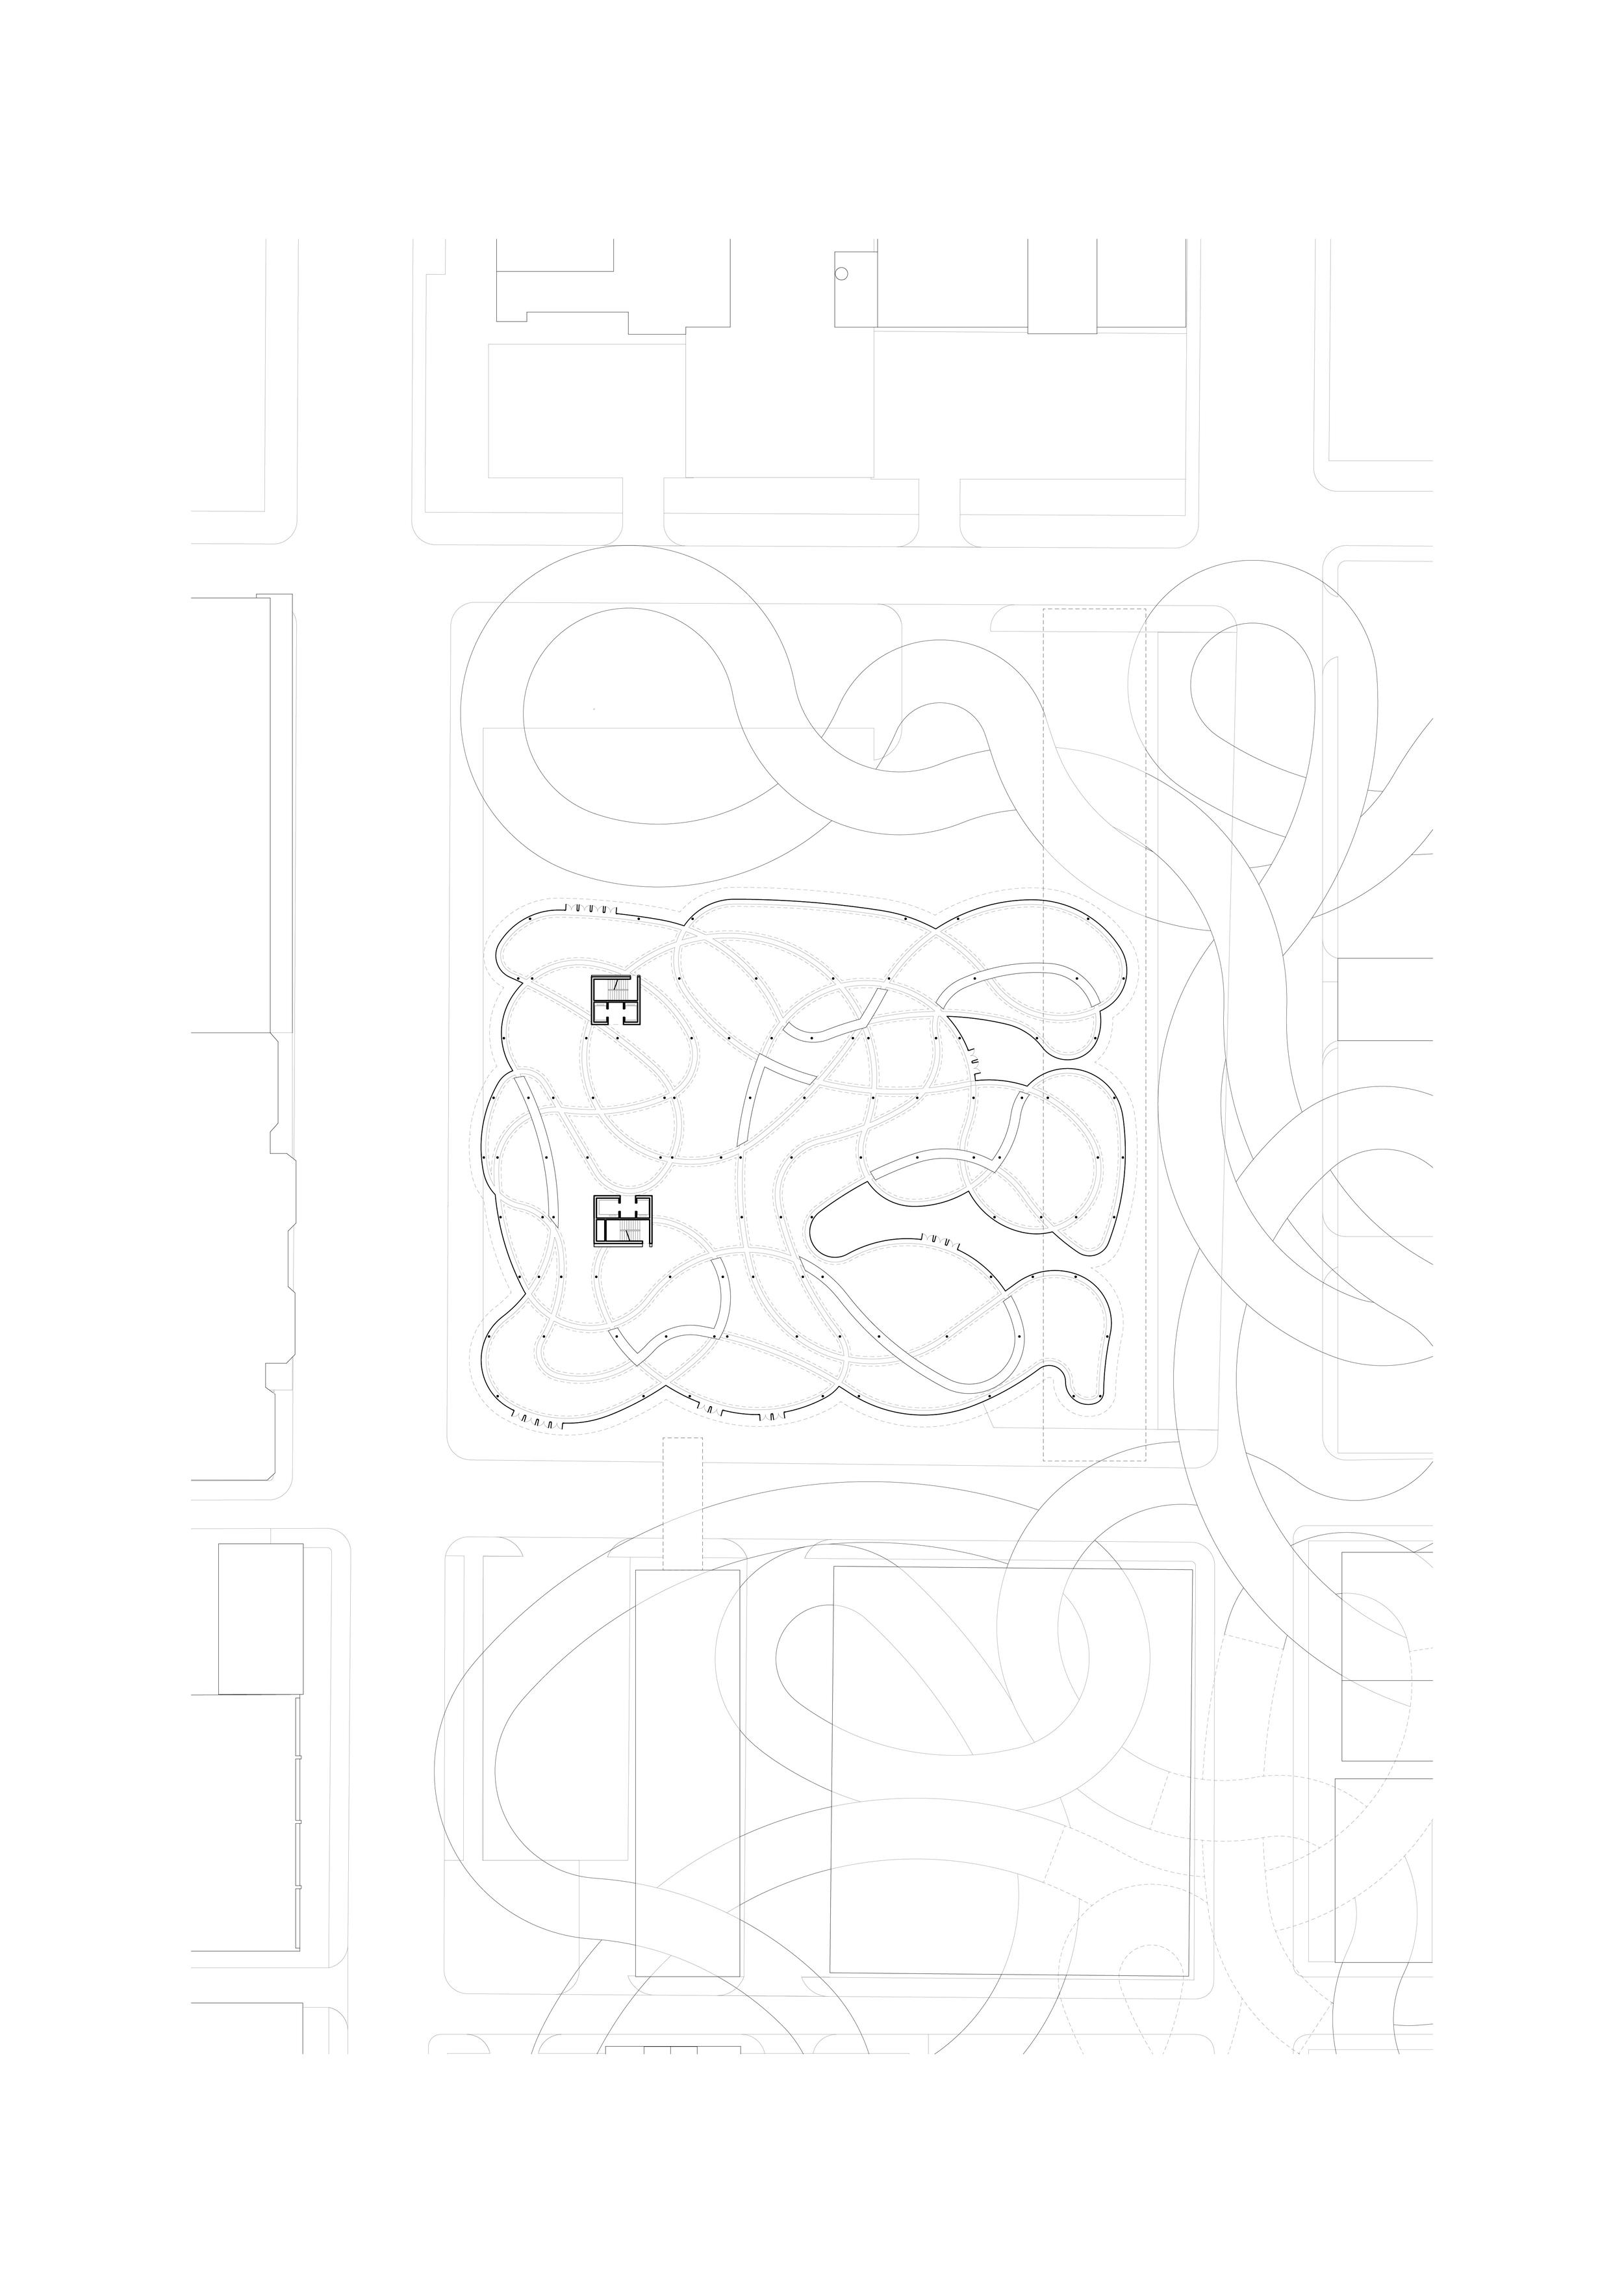 Grid_Squiggle_Artboard 1 copy 3.jpg